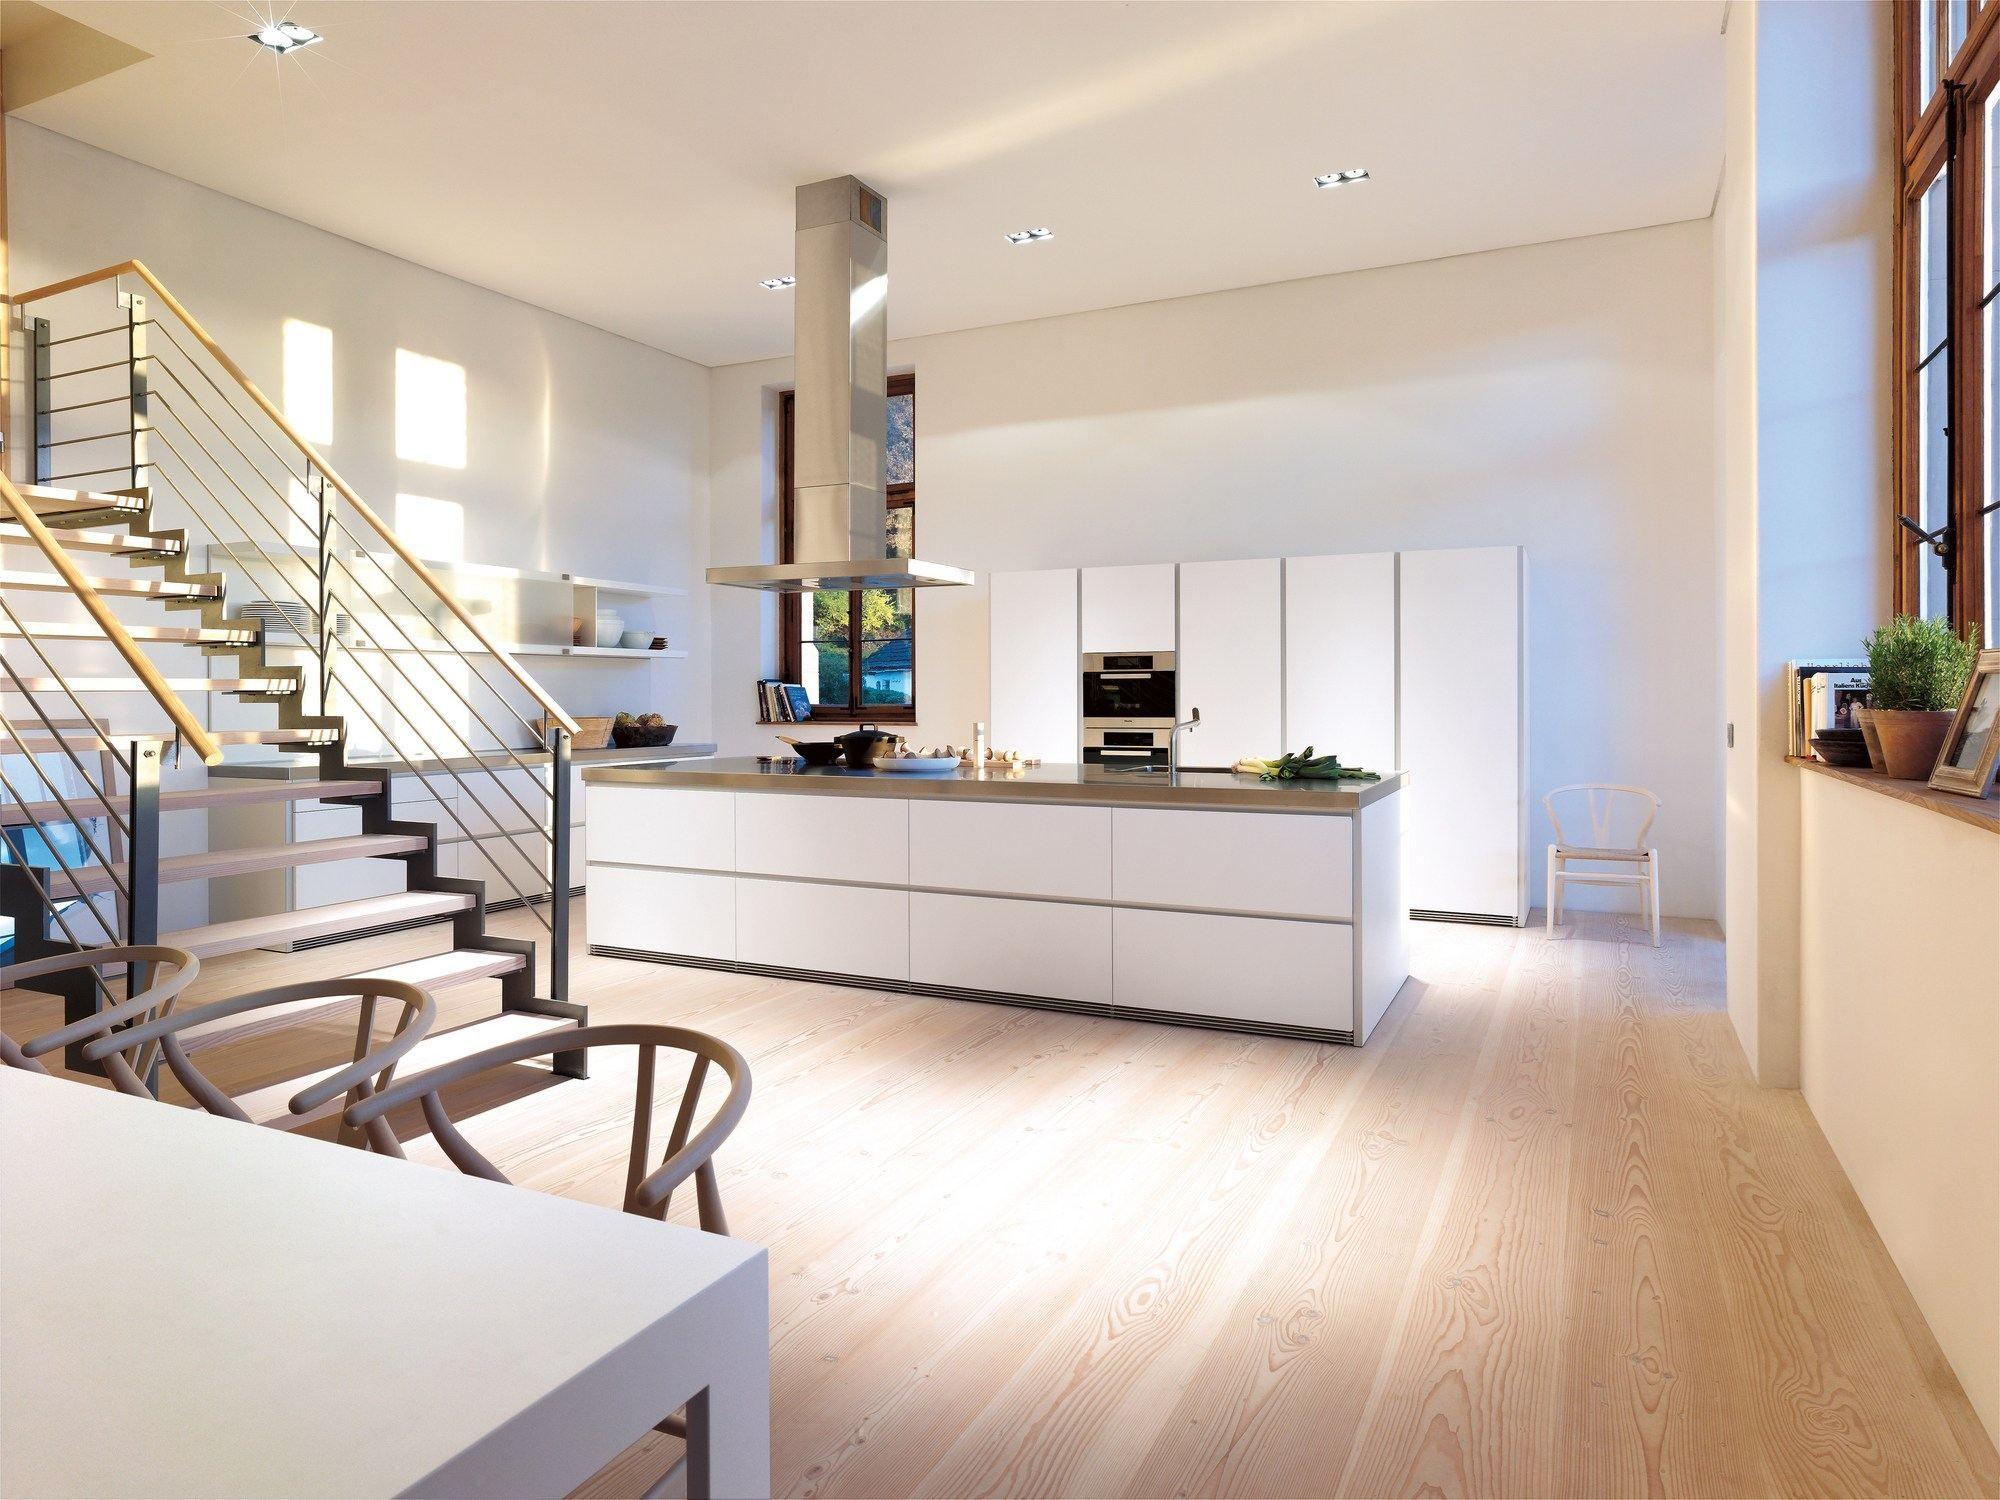 b1 cuisine avec lot by bulthaup. Black Bedroom Furniture Sets. Home Design Ideas